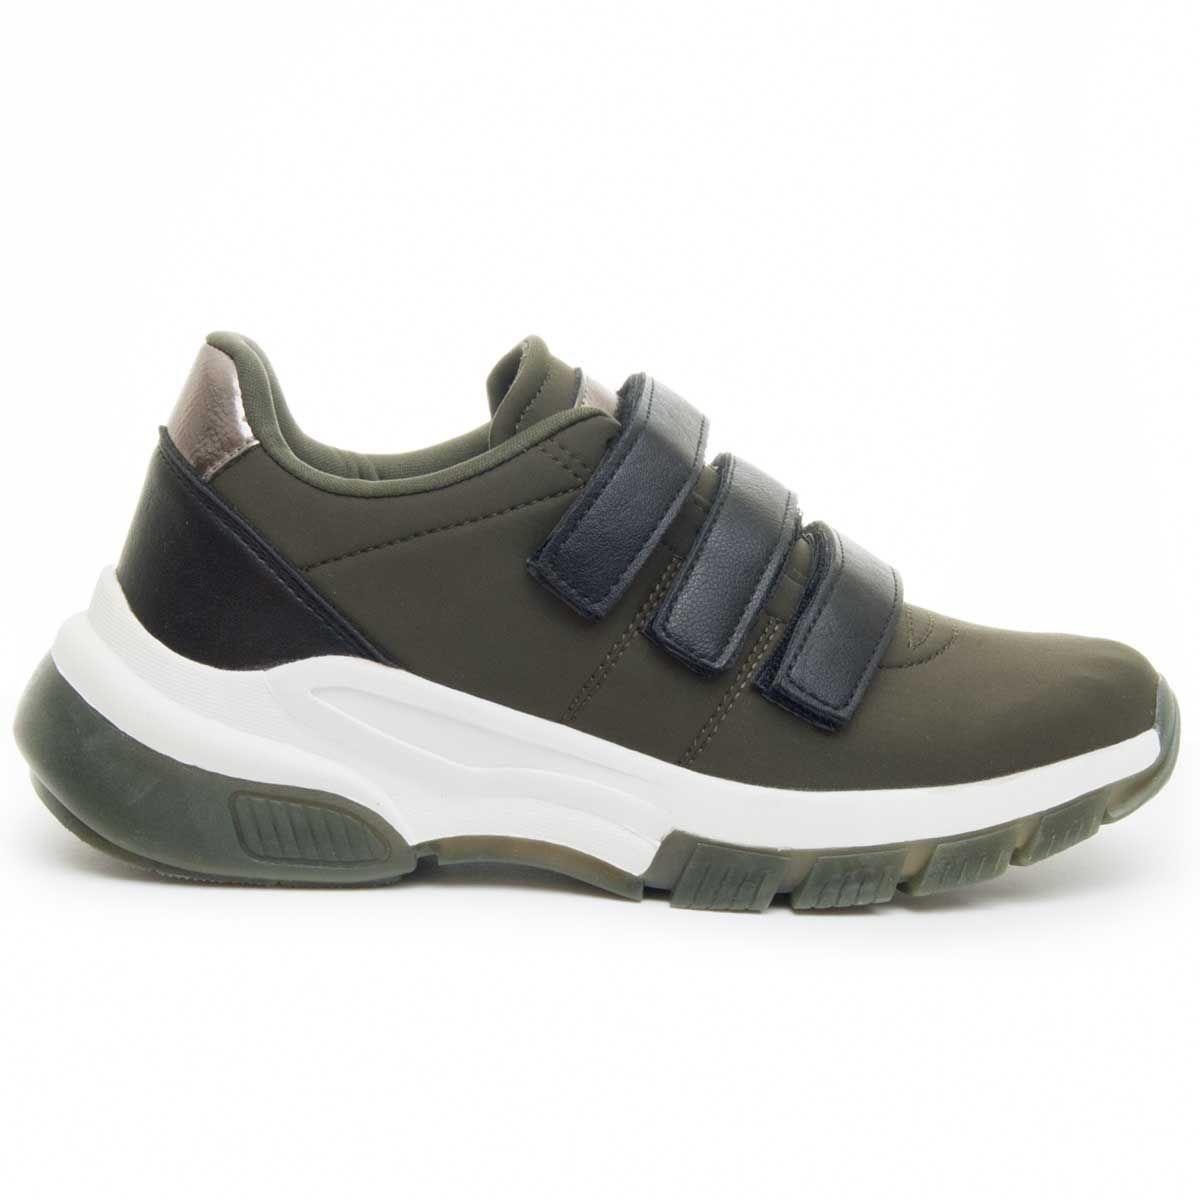 Montevita Sporty Sneaker in Green